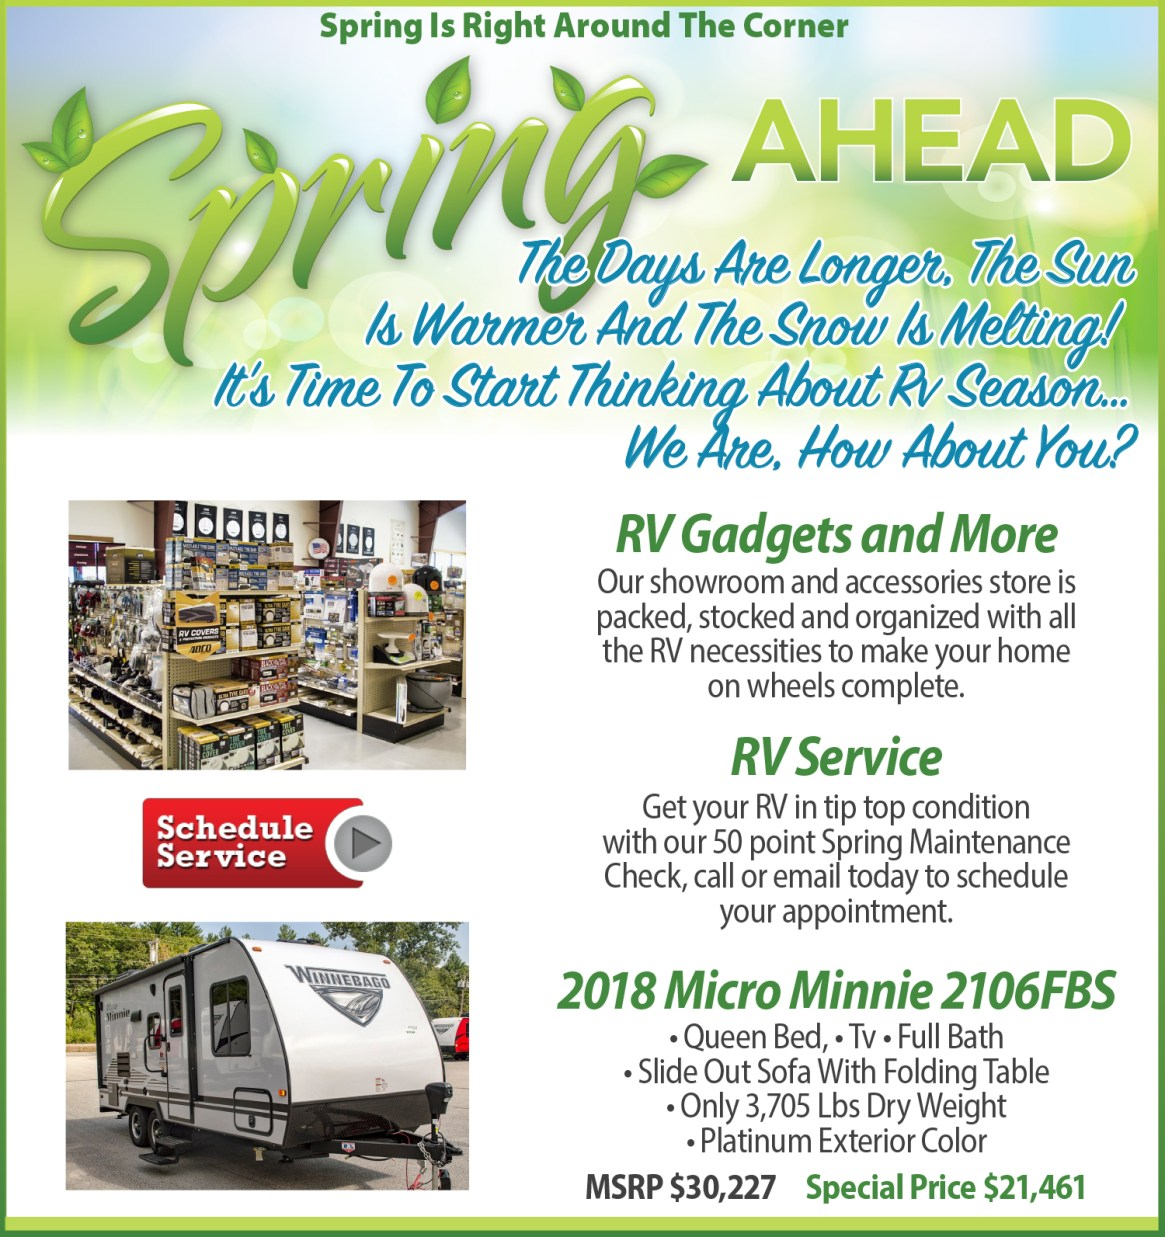 Spring Ahead 2020